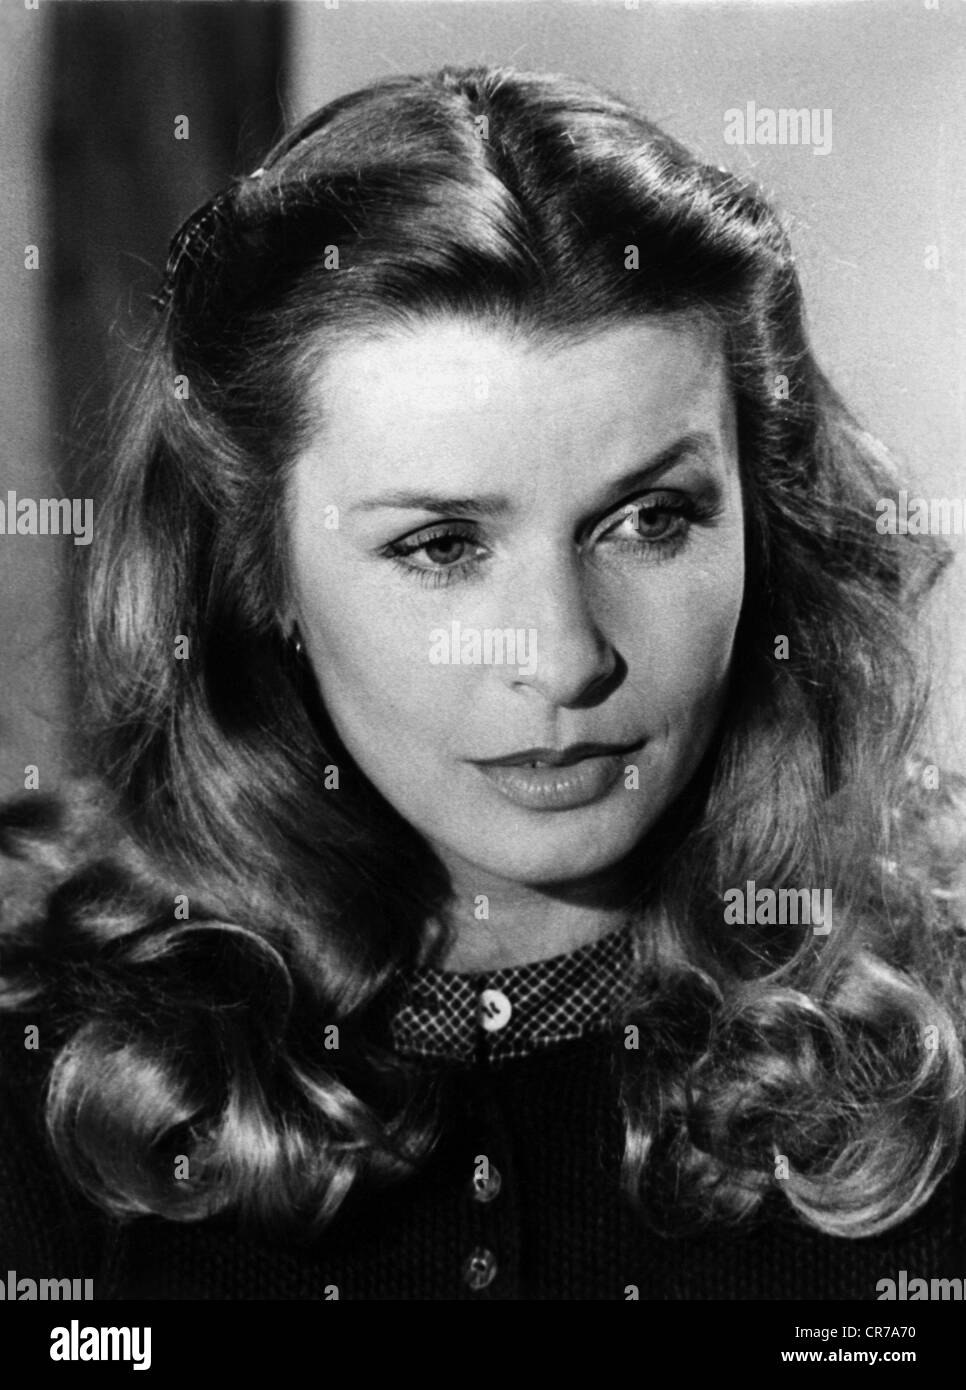 Berger, Senta, * 13.5.1941, Austrian actress, portrait, 1981, , Stock Photo